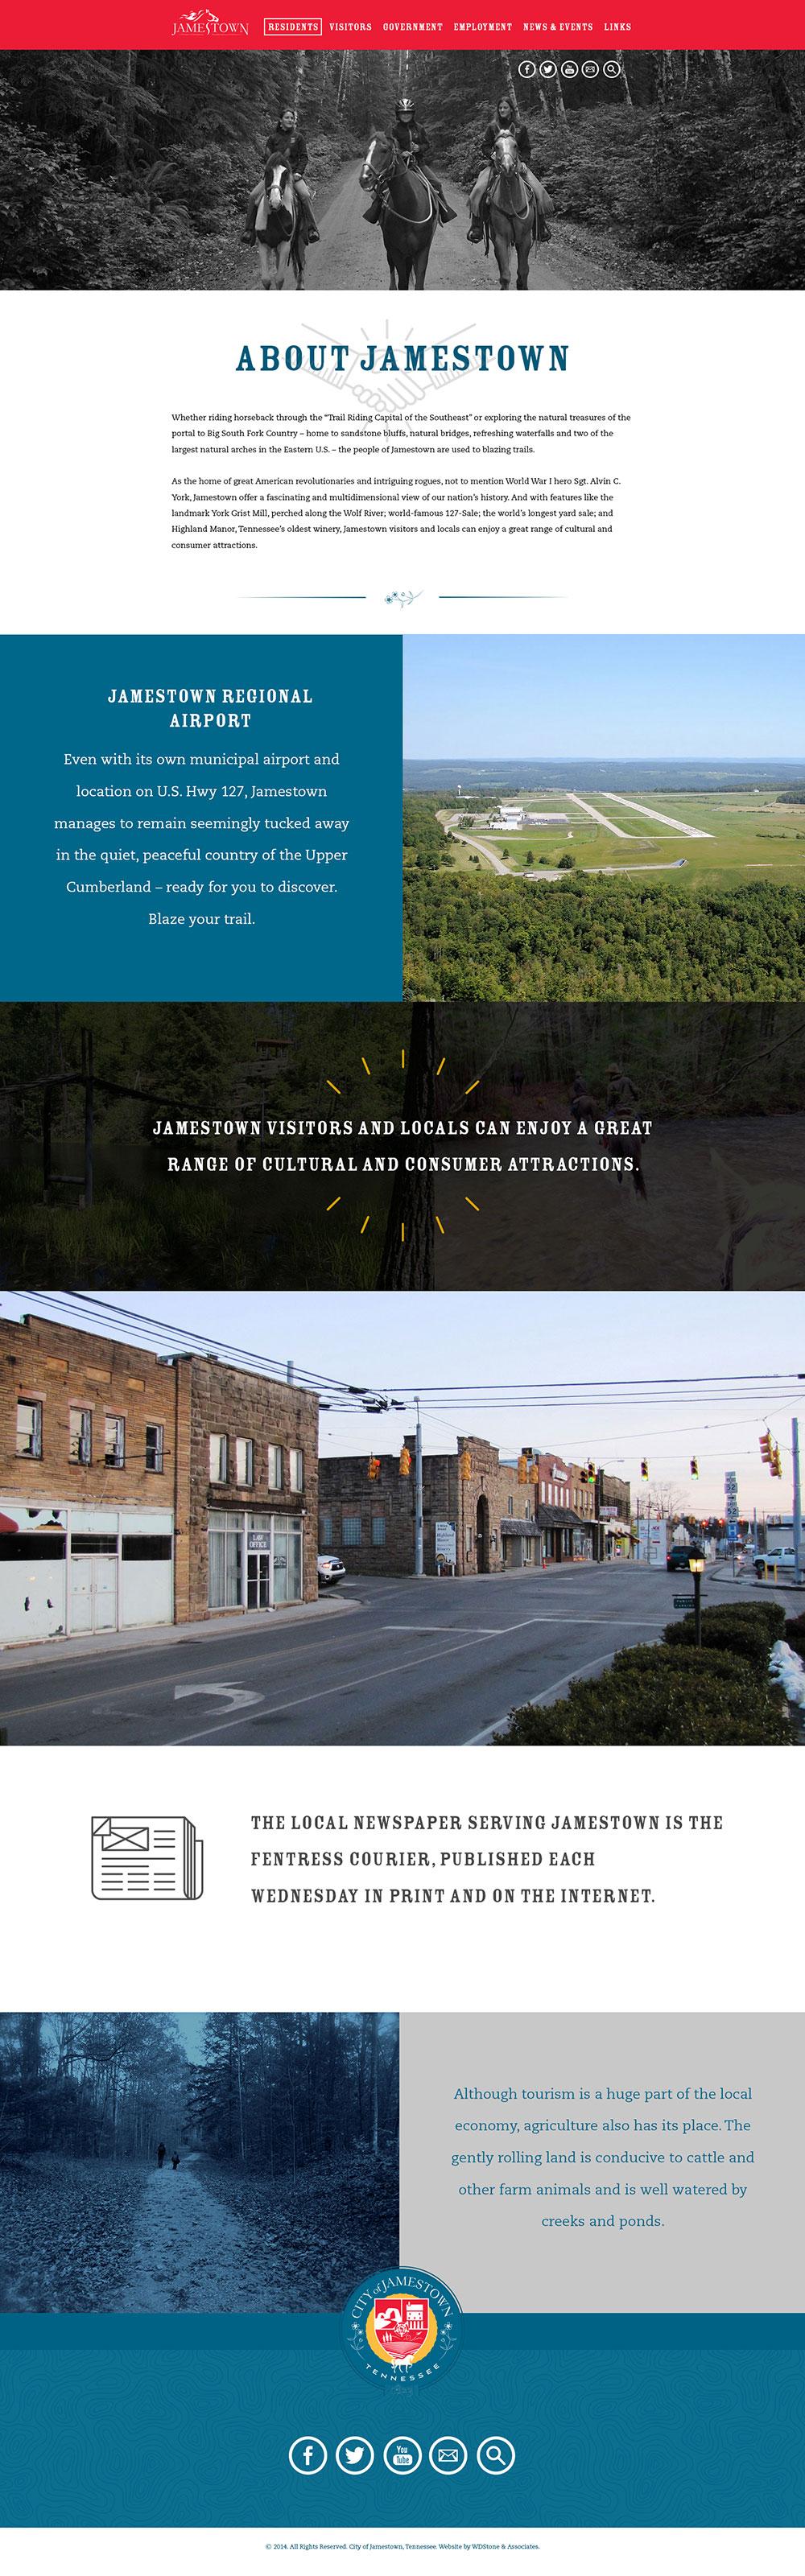 Web Design | Jamestown - Residents + About (Desktop View)